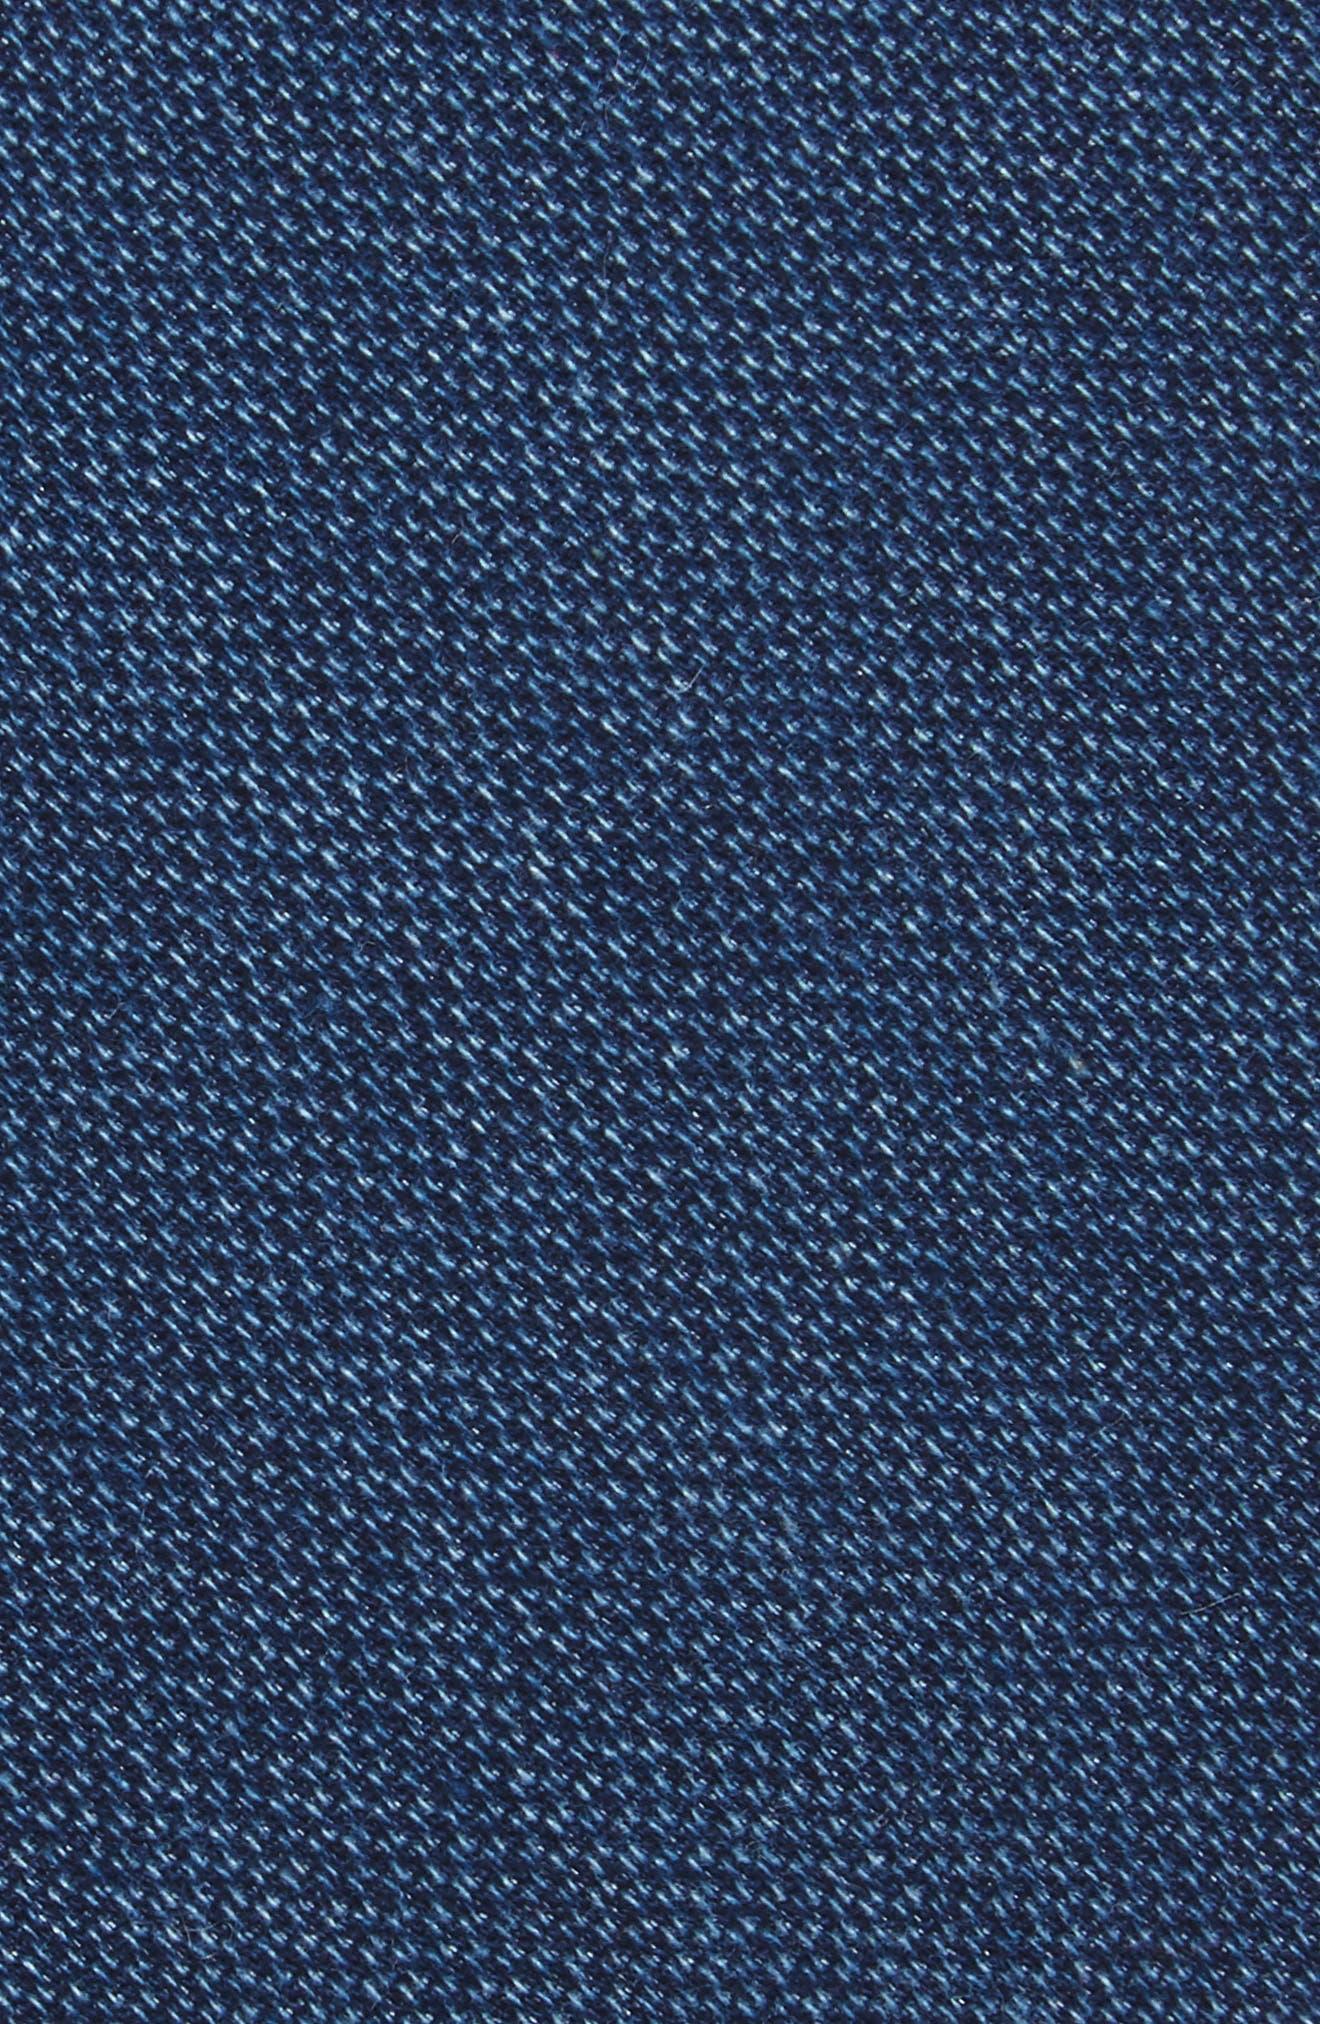 Verona Solid Cotton Skinny Tie,                             Alternate thumbnail 2, color,                             Navy